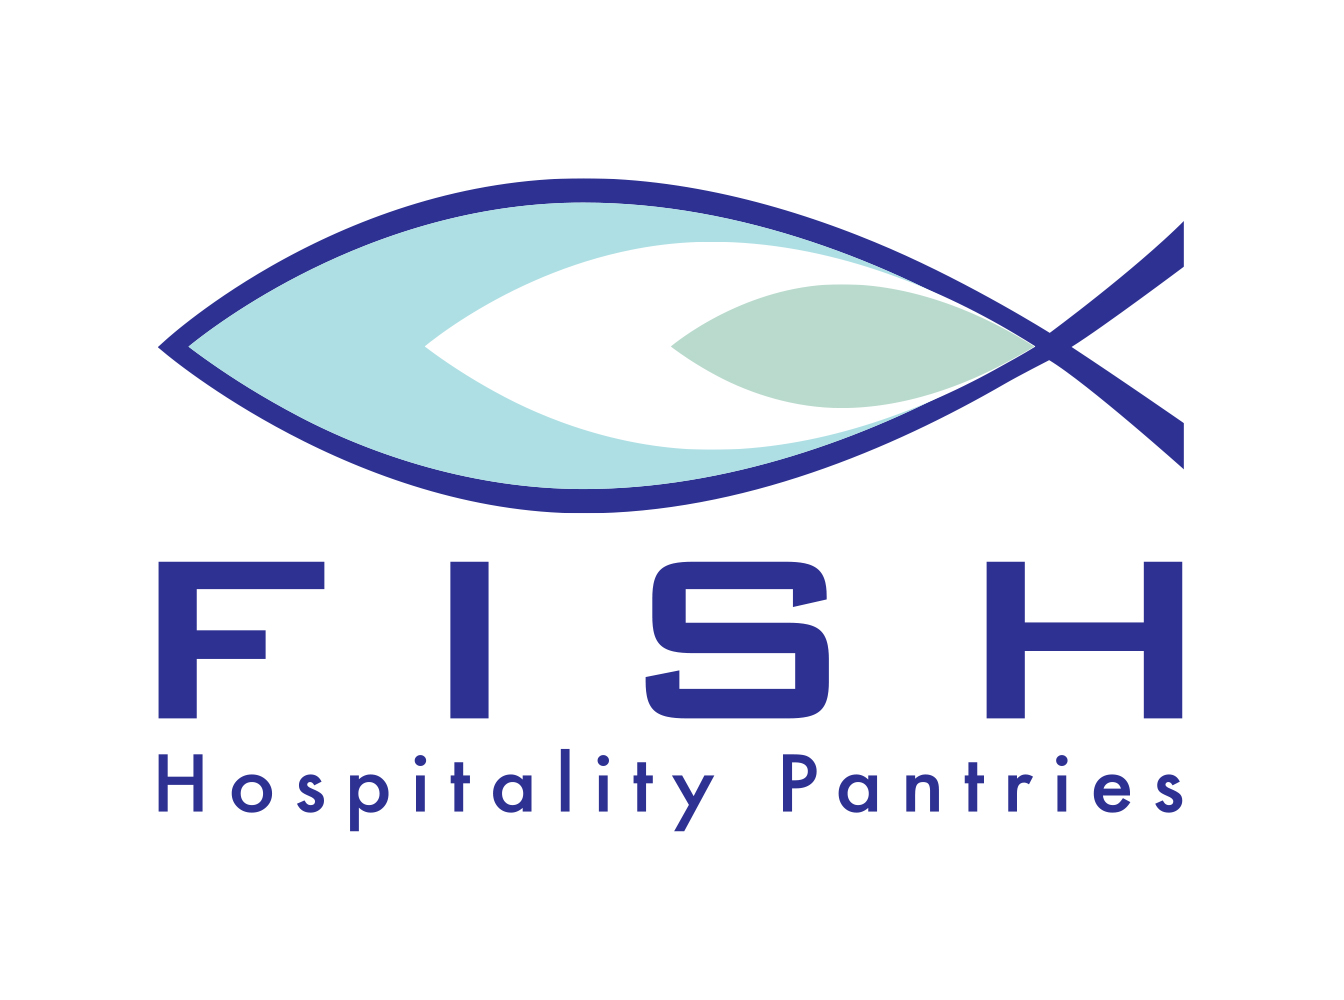 fishlogo1final.jpg